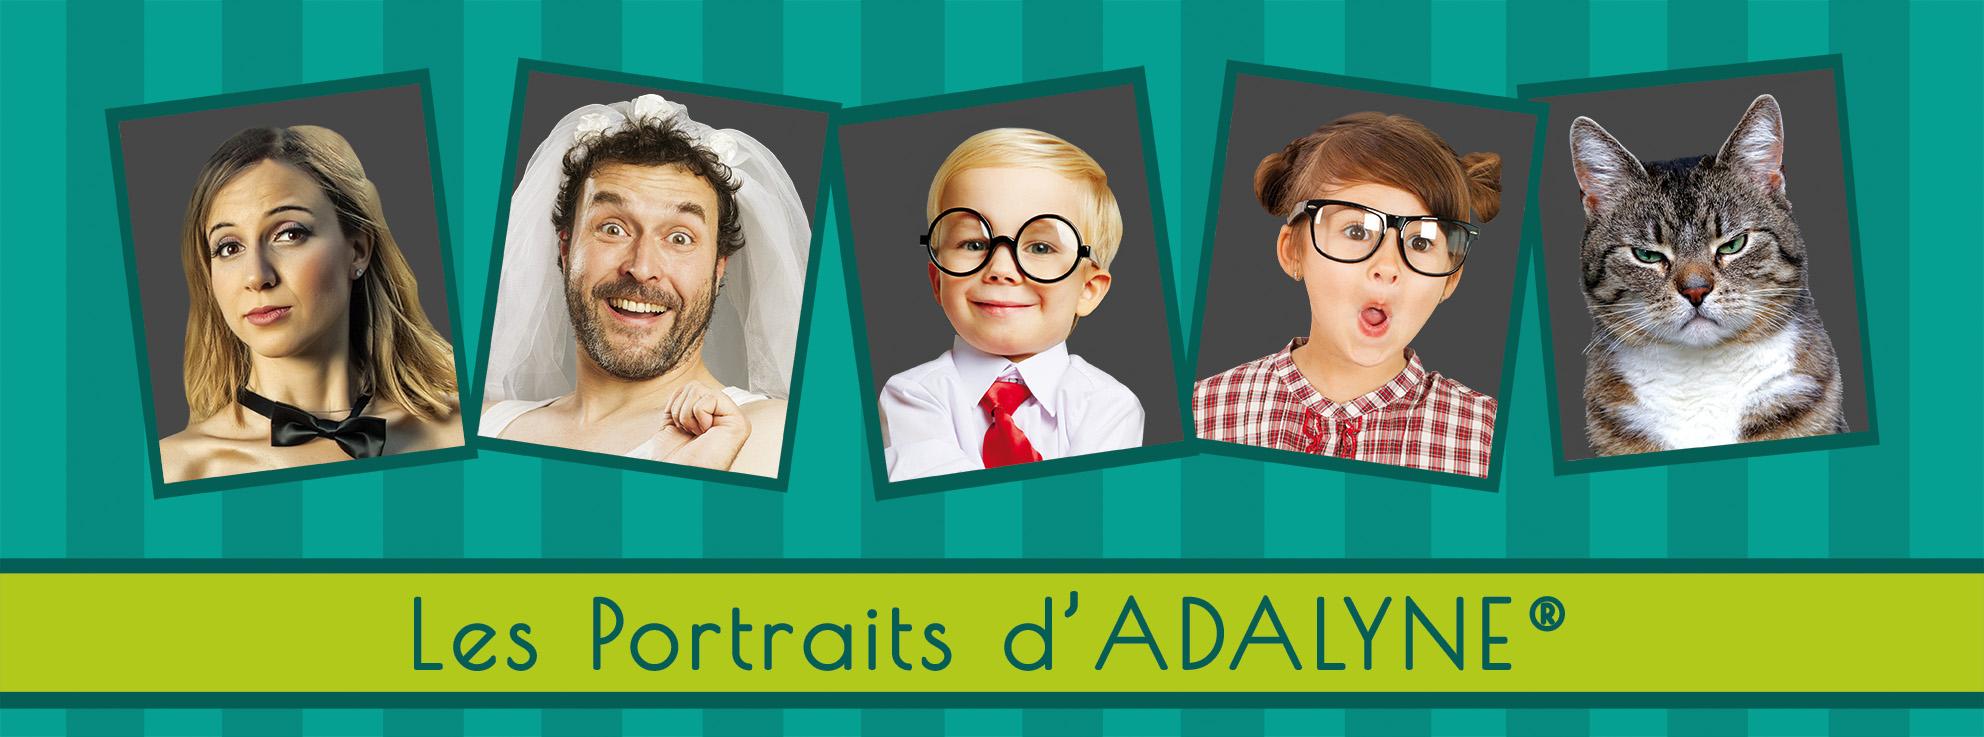 Les portraits d'Adalyne